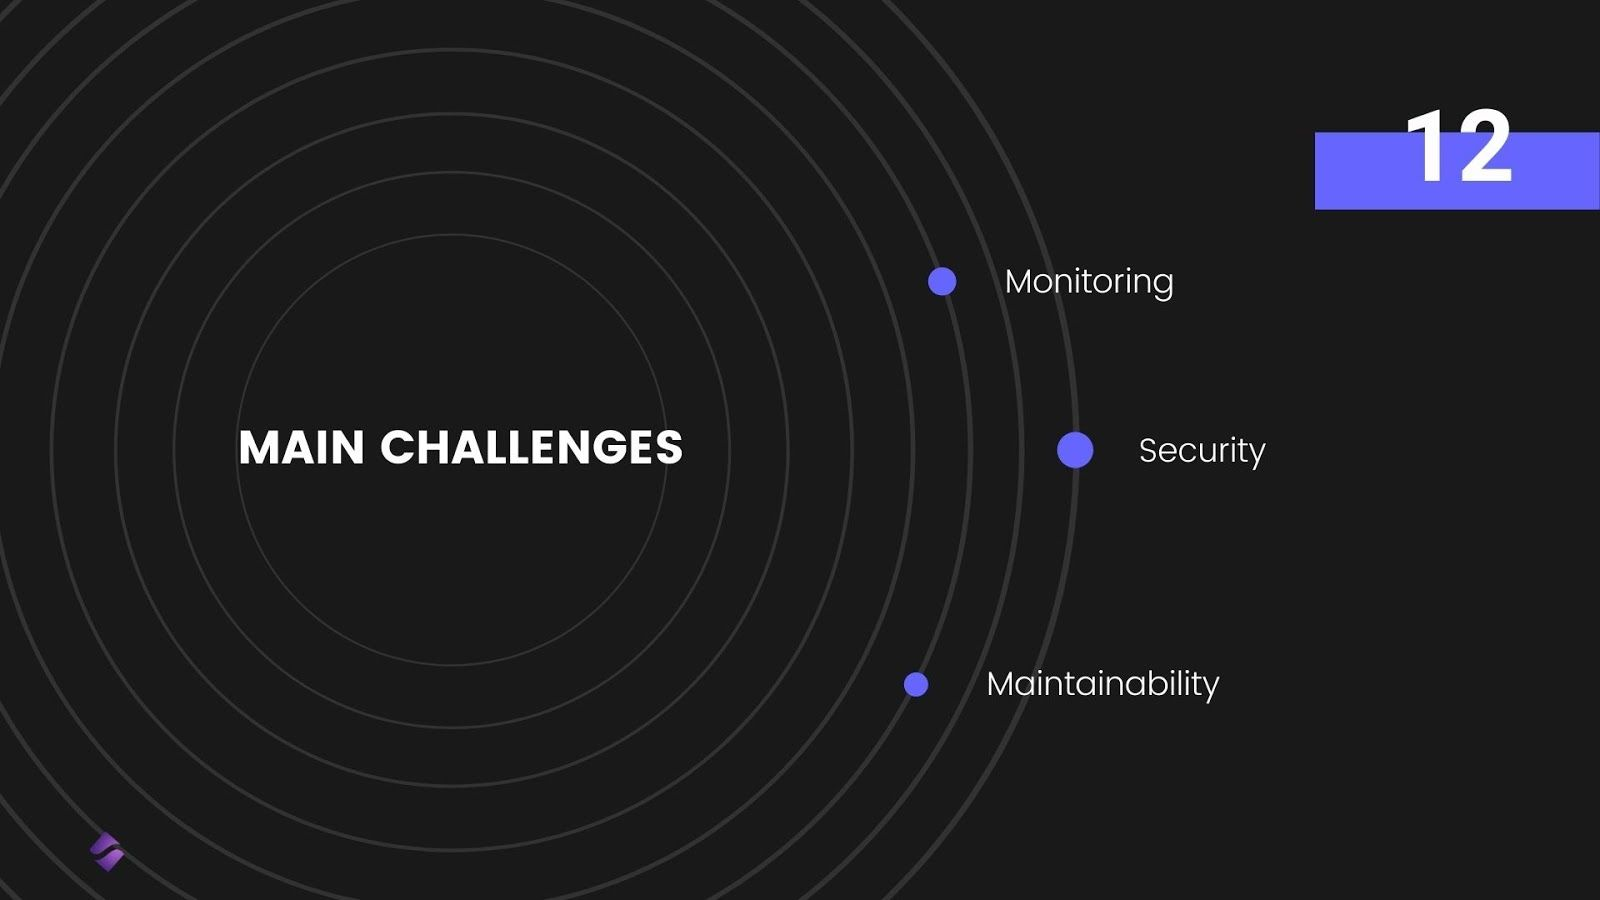 Unlocking eMobility platform using Open Standards - Main challenges